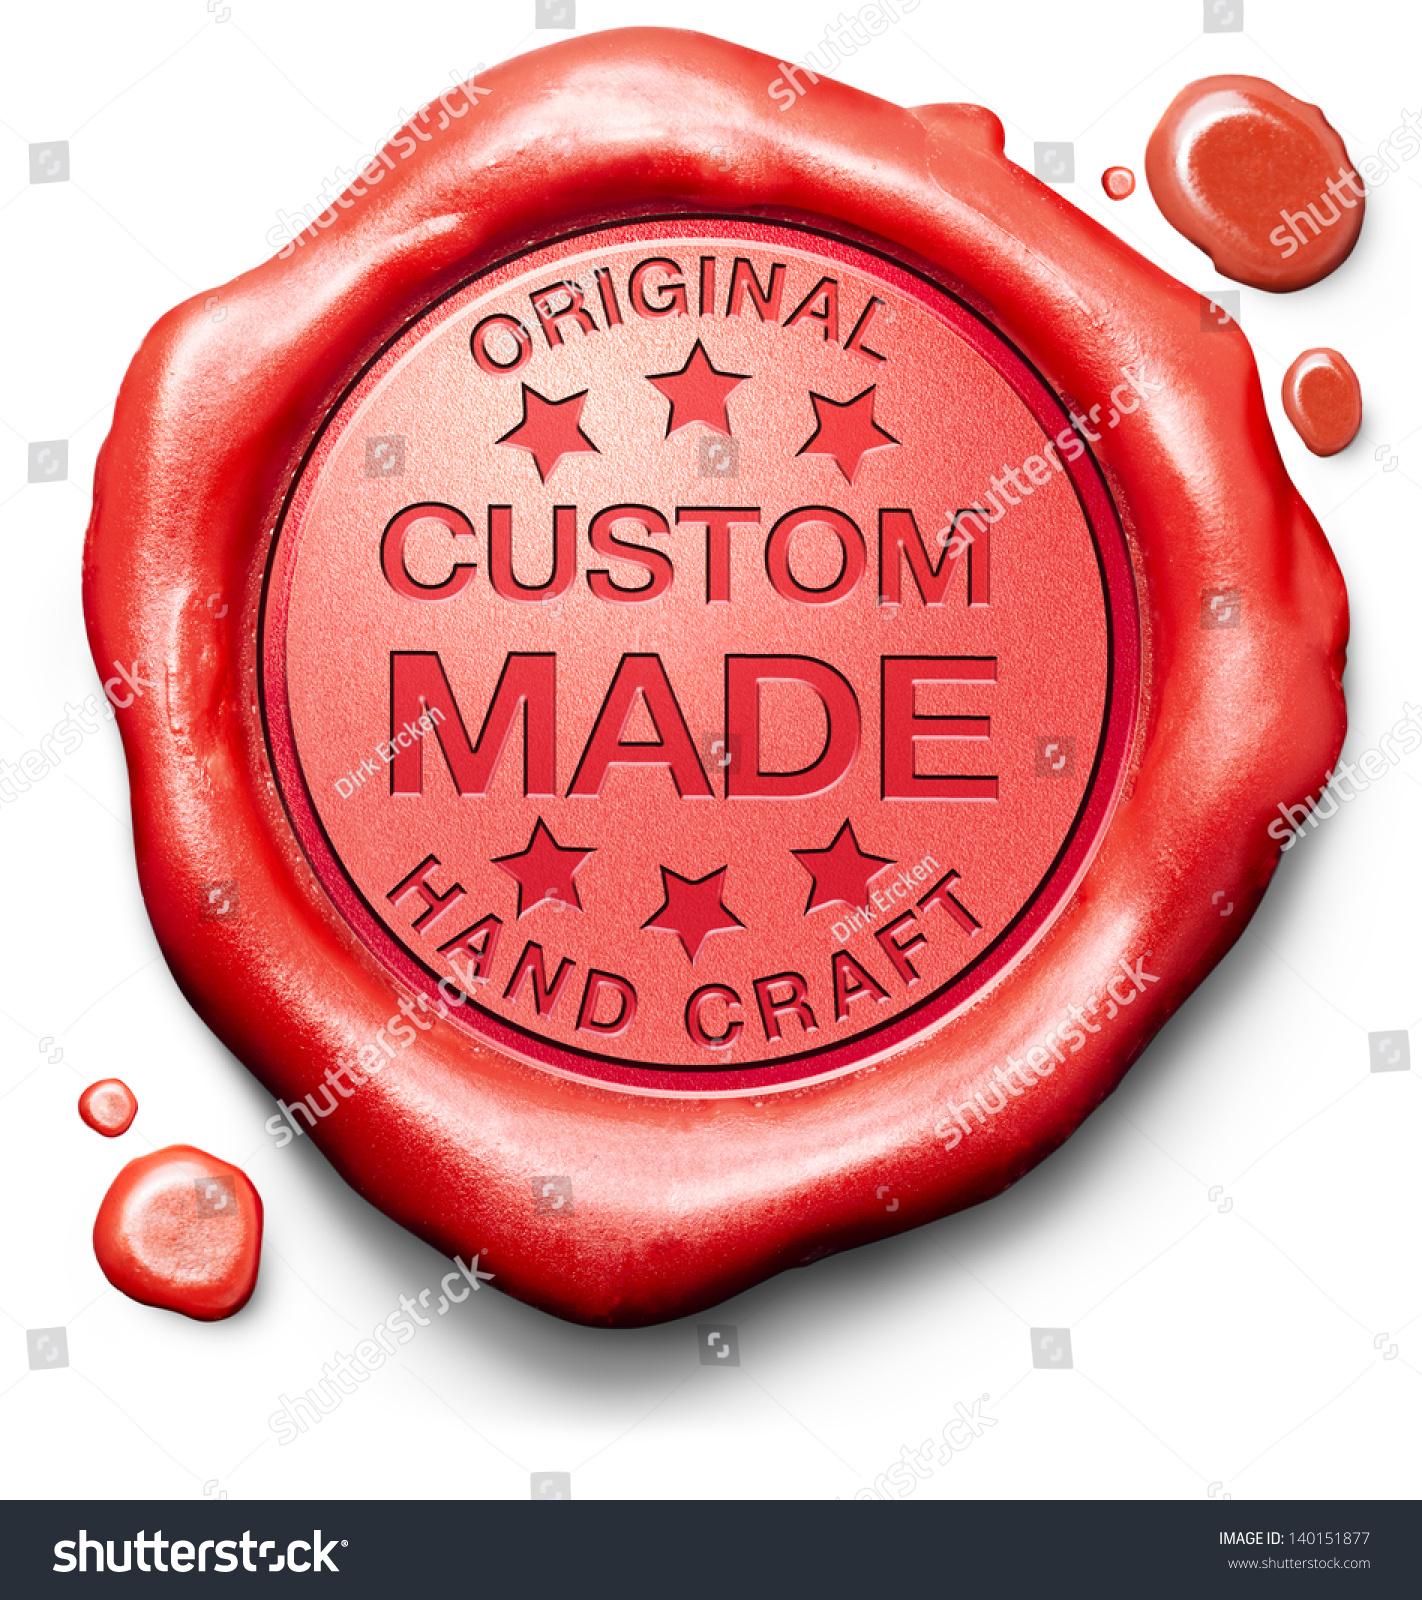 Custom made customized handcraft hand crafted stock for Handcrafted or hand crafted